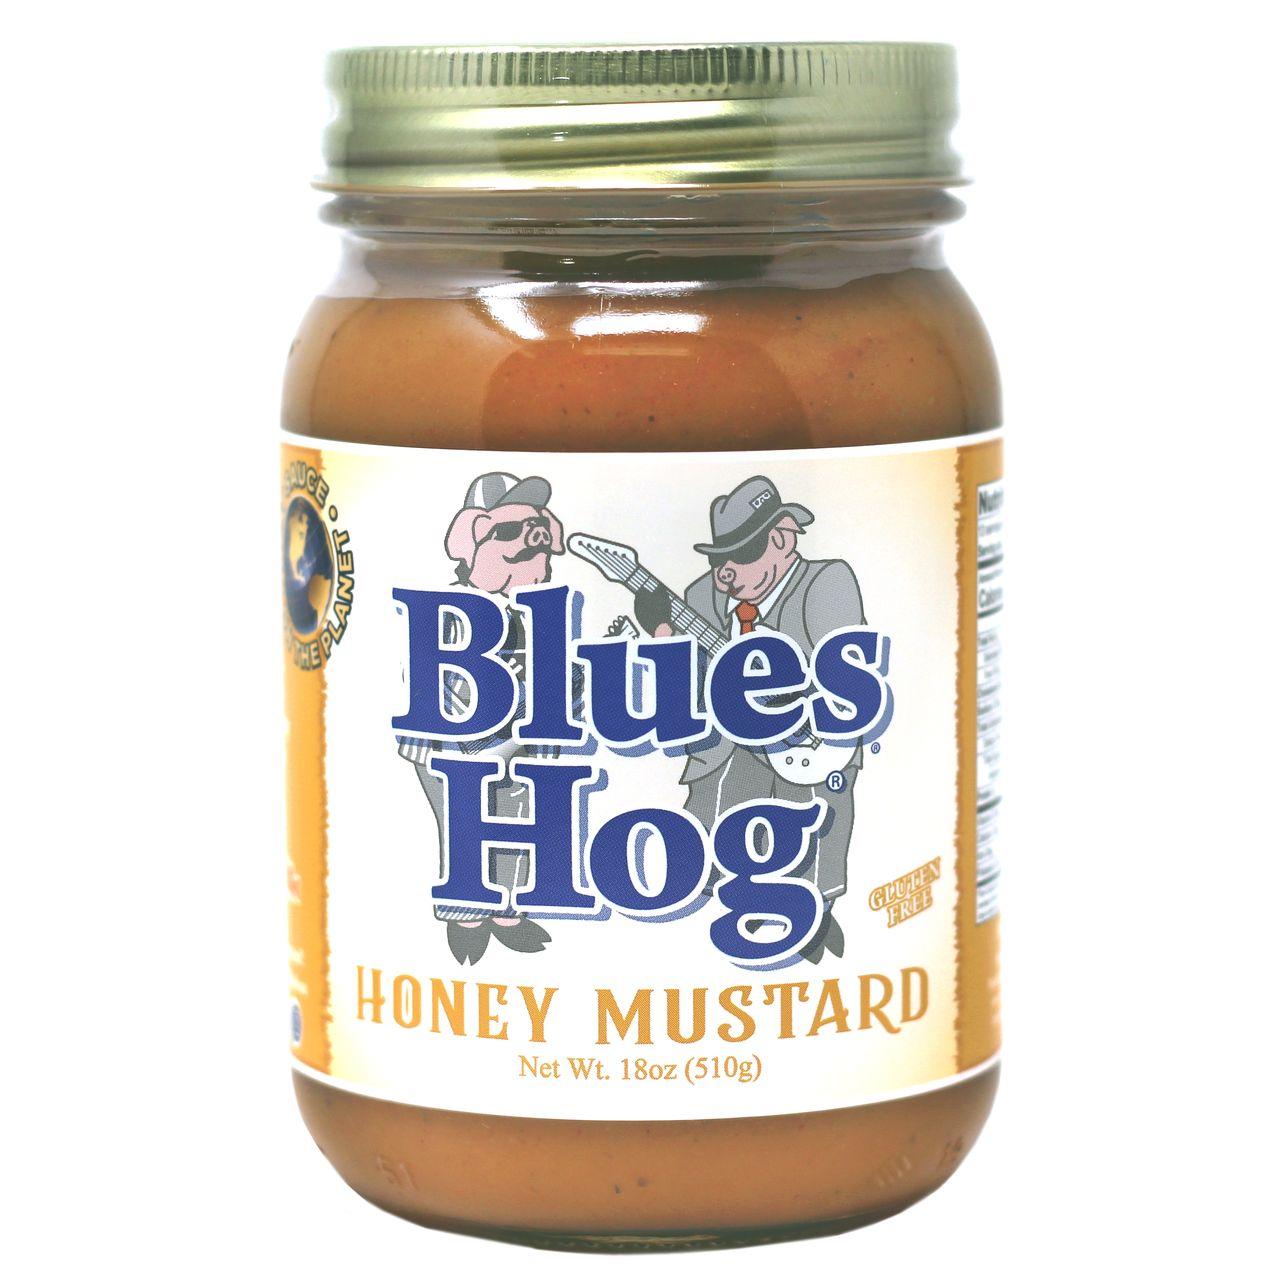 Blues Hog 18 oz Honey Mustard Sauce